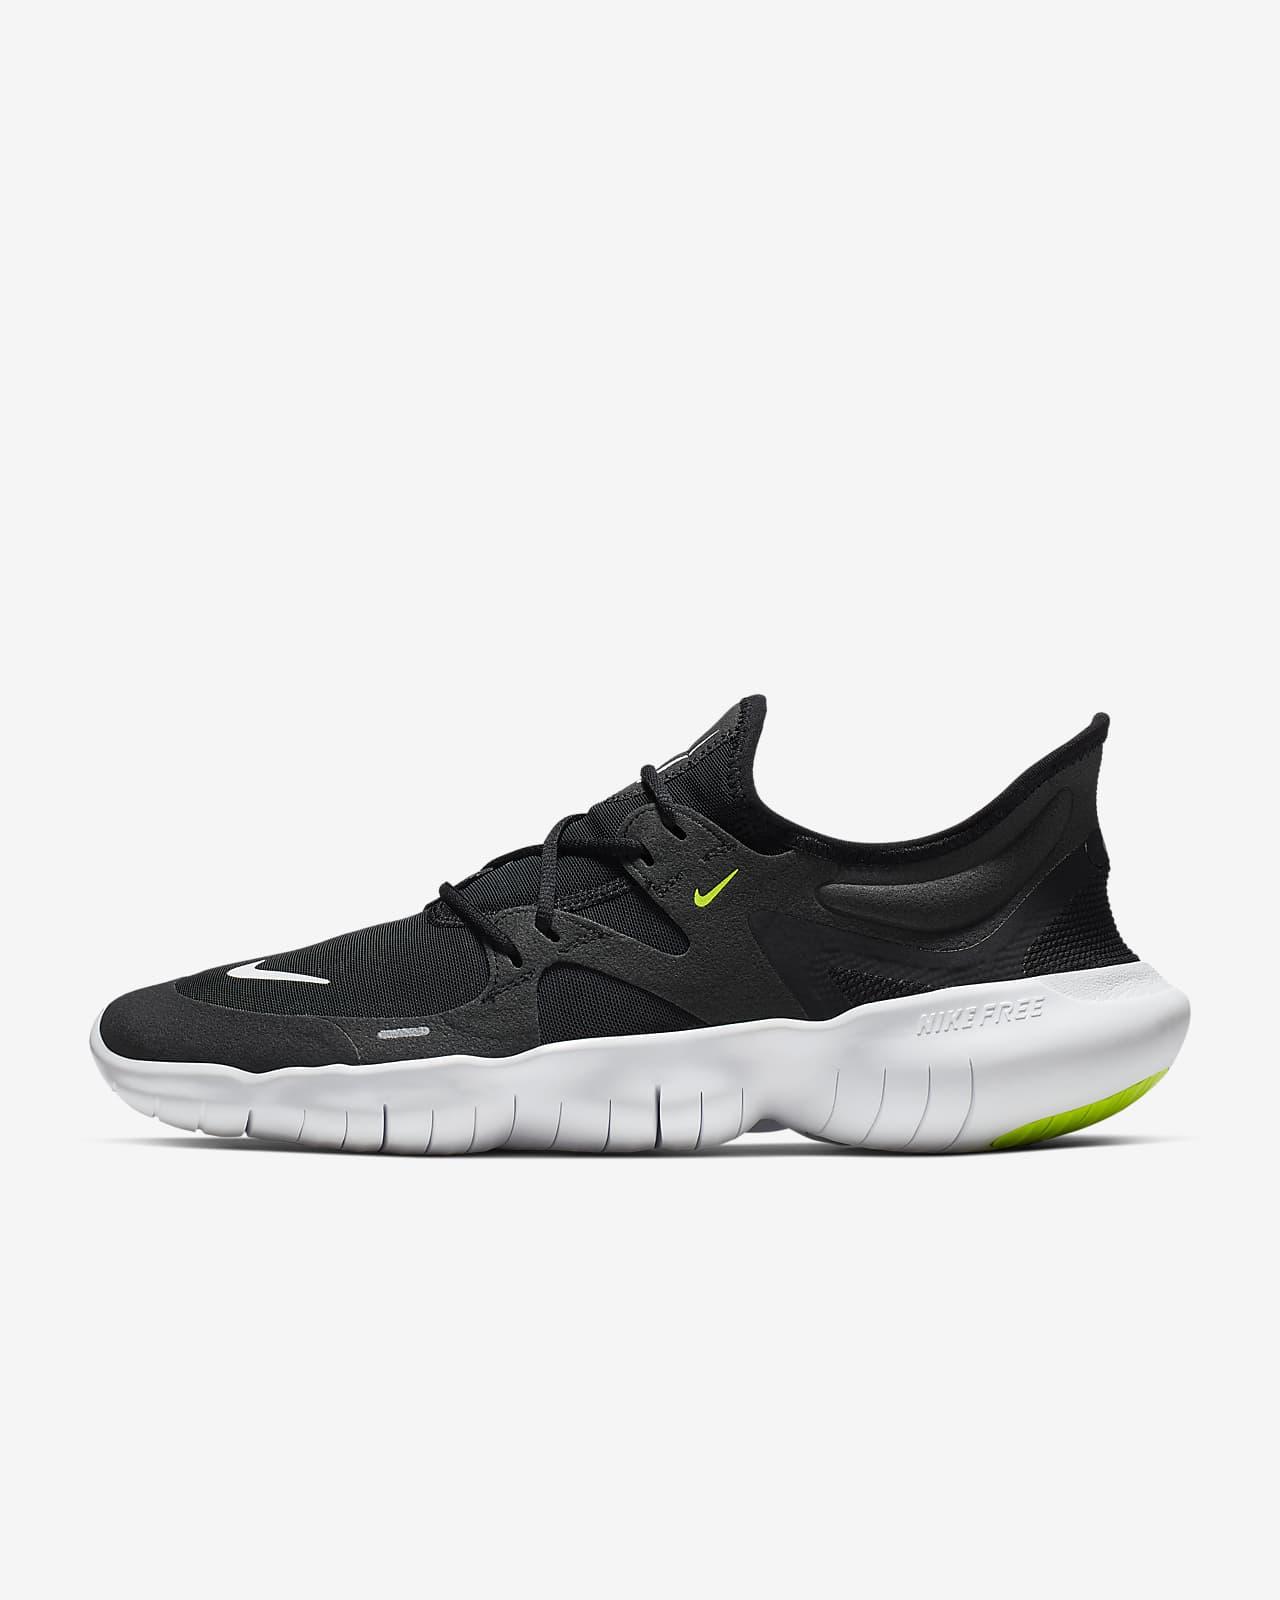 Nike Free RN 5.0 2020 løbesko til mænd. Nike DK